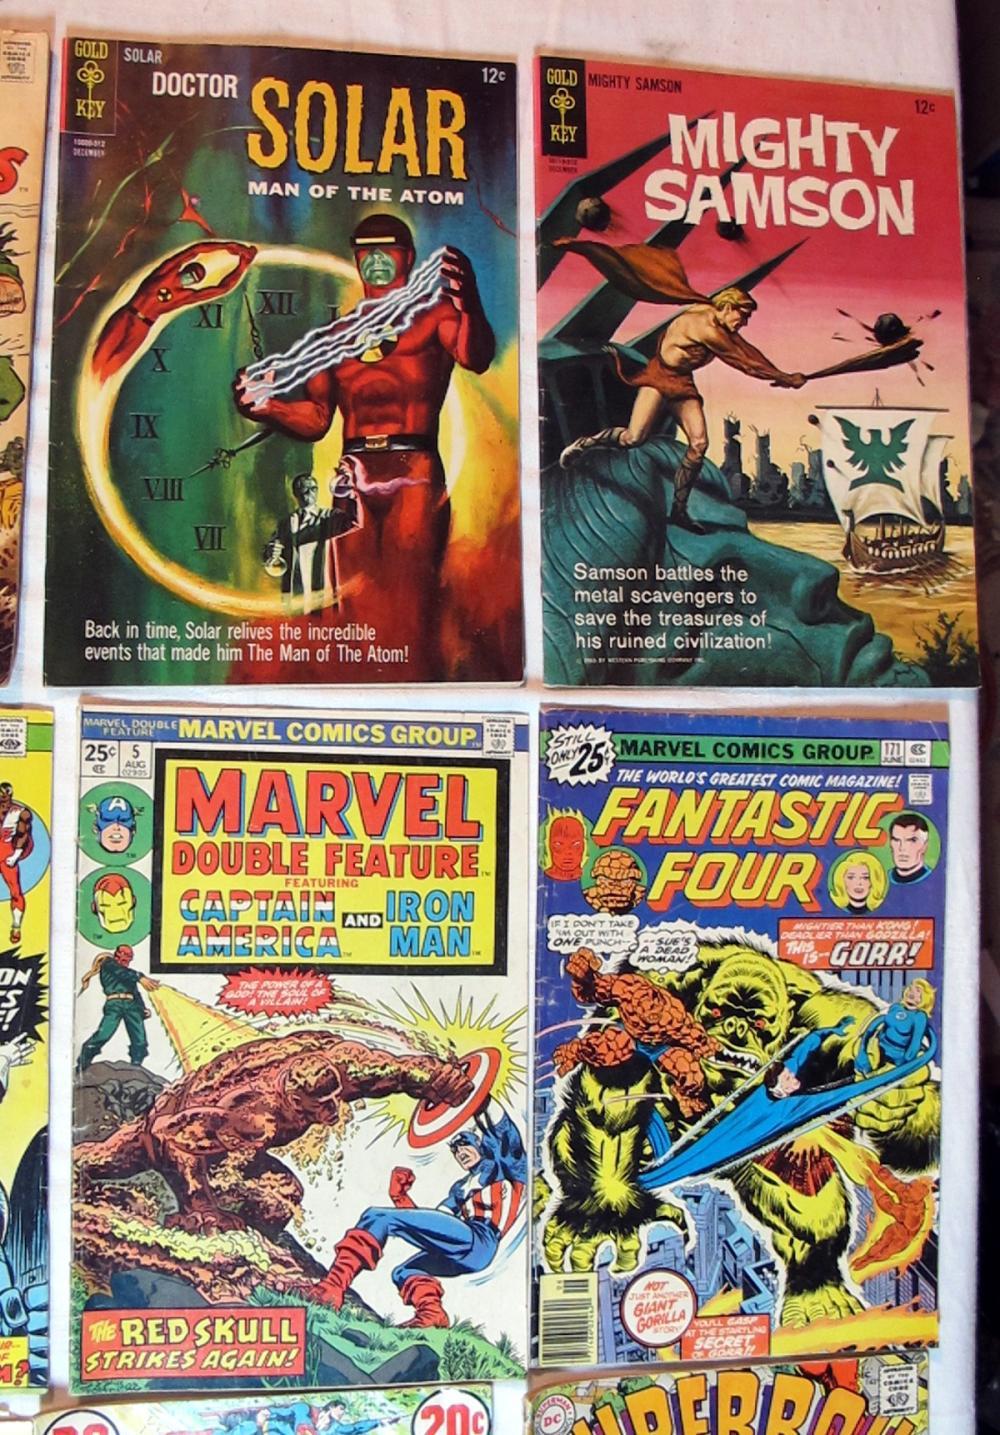 Lot 134: 12 SILVER AGE DC MARVEL GOLD KEY COMICS FANTASTIC FOUR SUPERMAN DR SOLAR SAMSON MORE